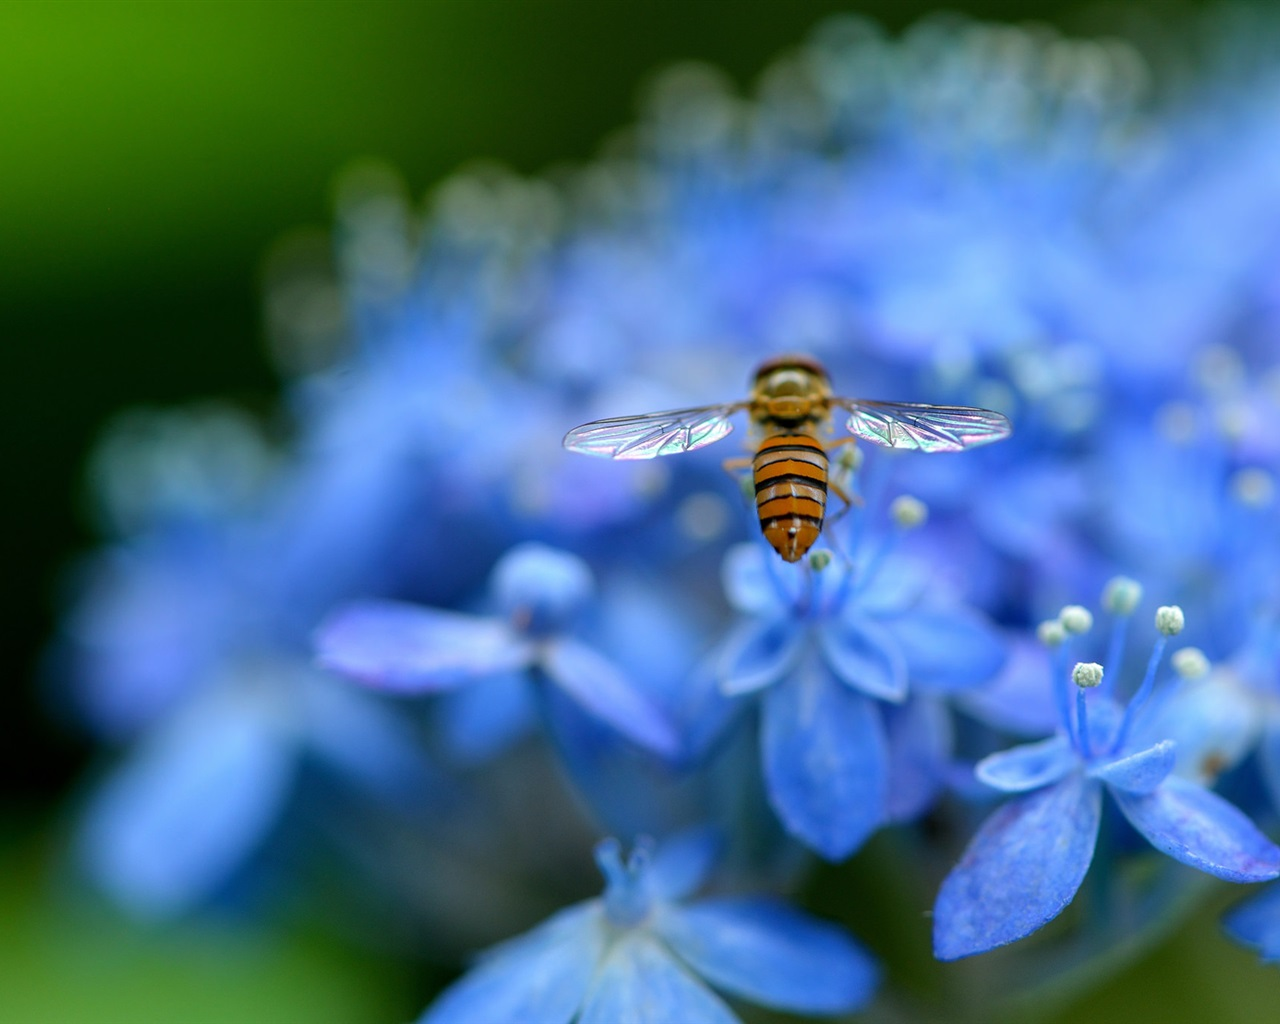 blaue hortensien bl tenbl tter blumen insekt biene 1920x1200 hd hintergrundbilder hd bild. Black Bedroom Furniture Sets. Home Design Ideas